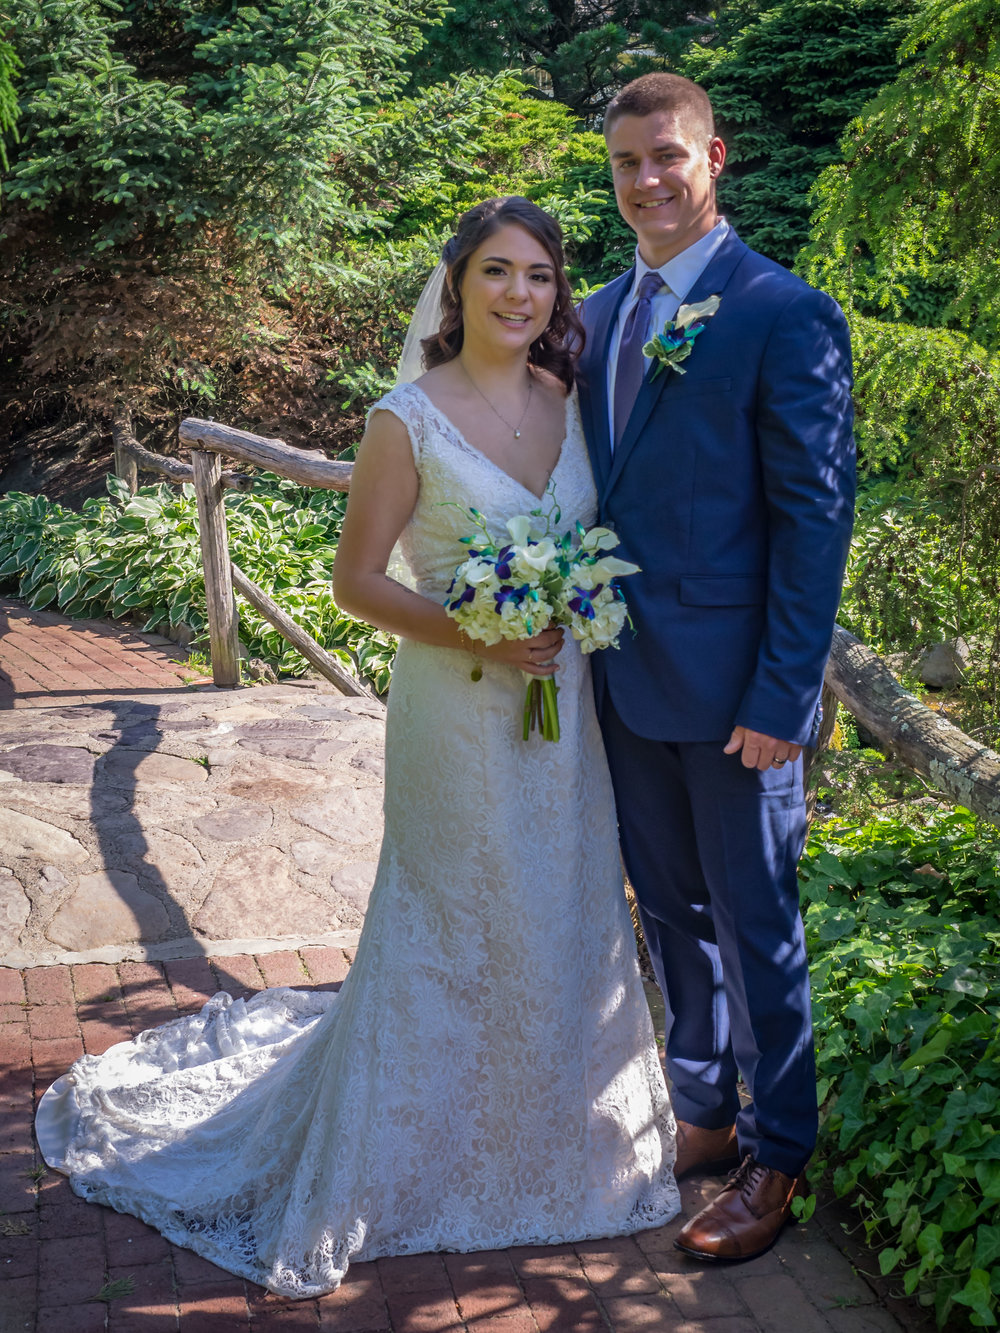 15 - Haines Couple - 20180616 - Haines -67514.jpg